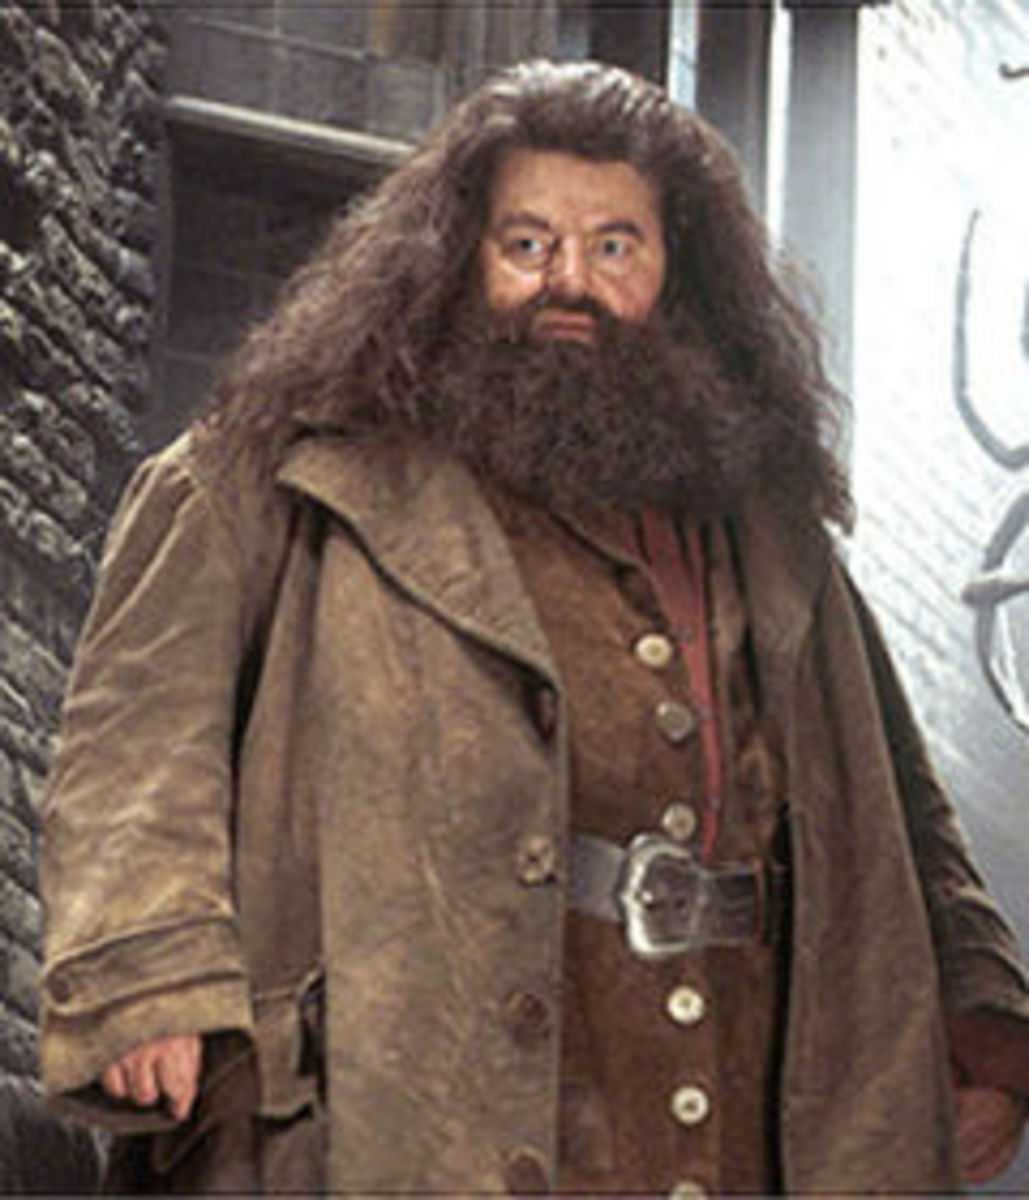 Actor Robbie Coltrane as Rubeus Hagrid